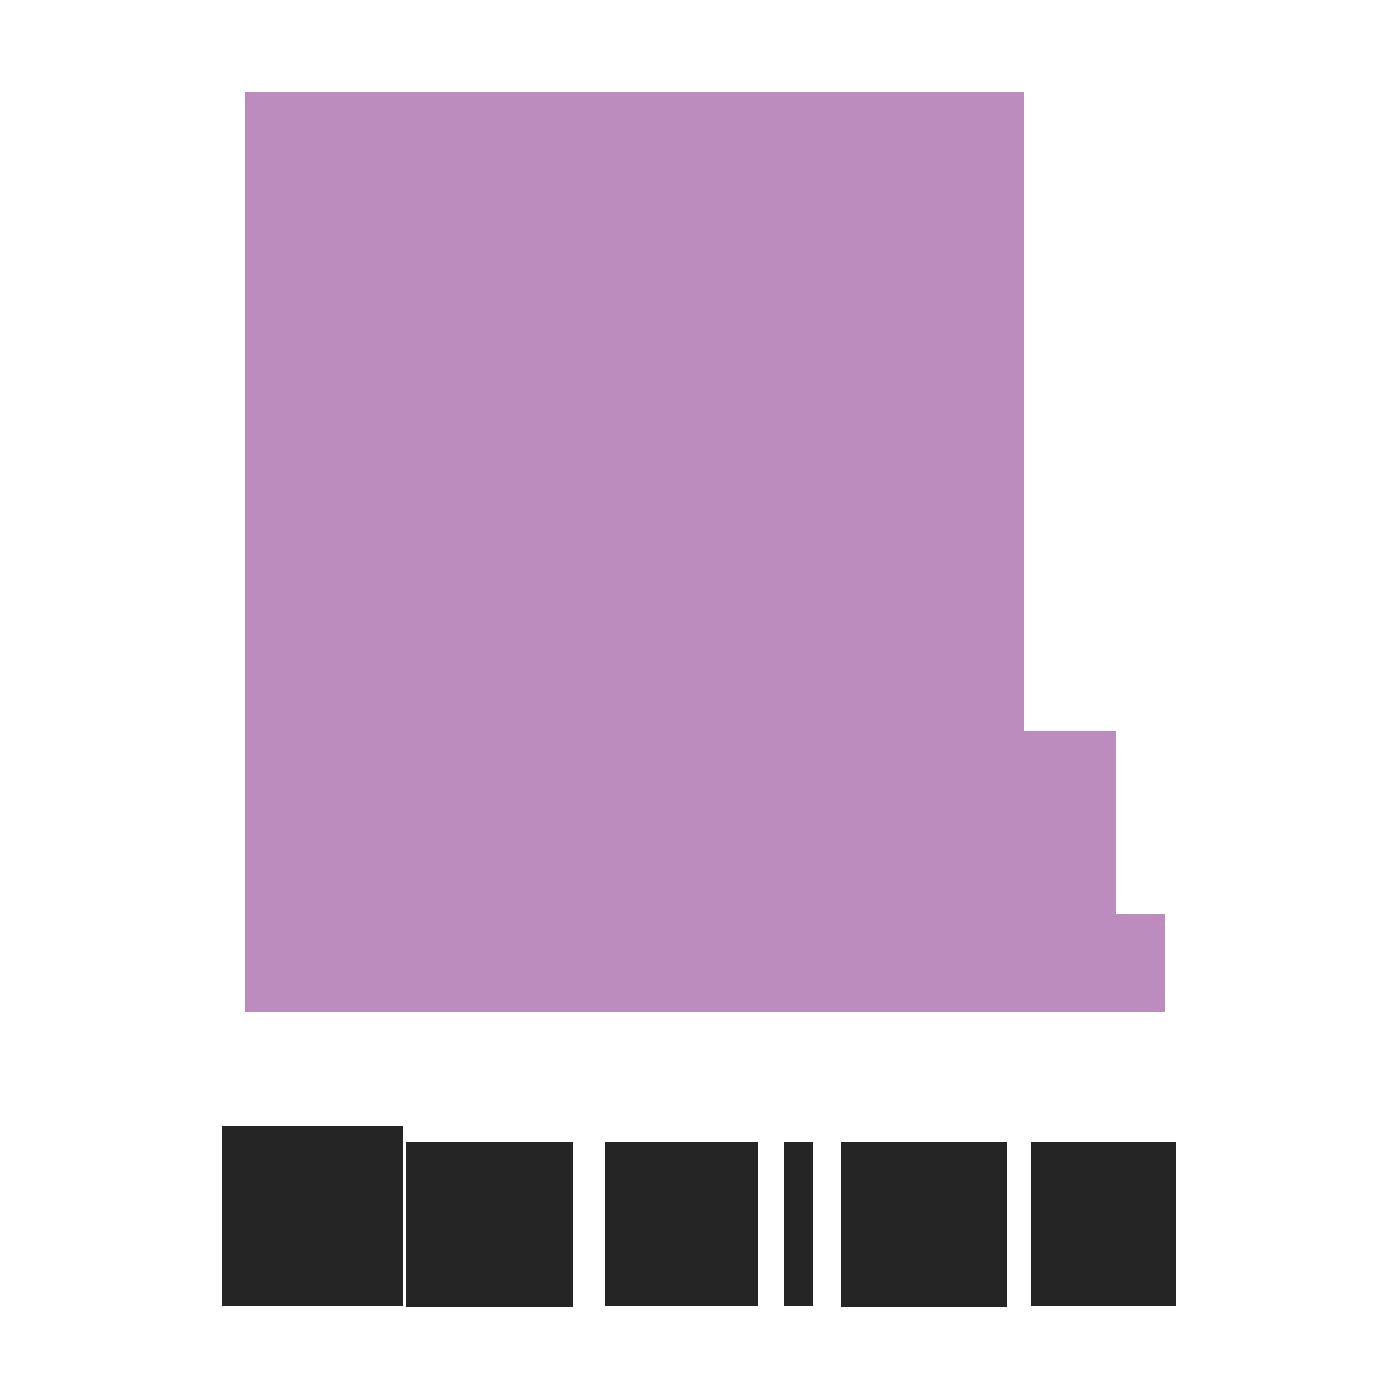 AudiosLogo_2019MAR21 copy.png